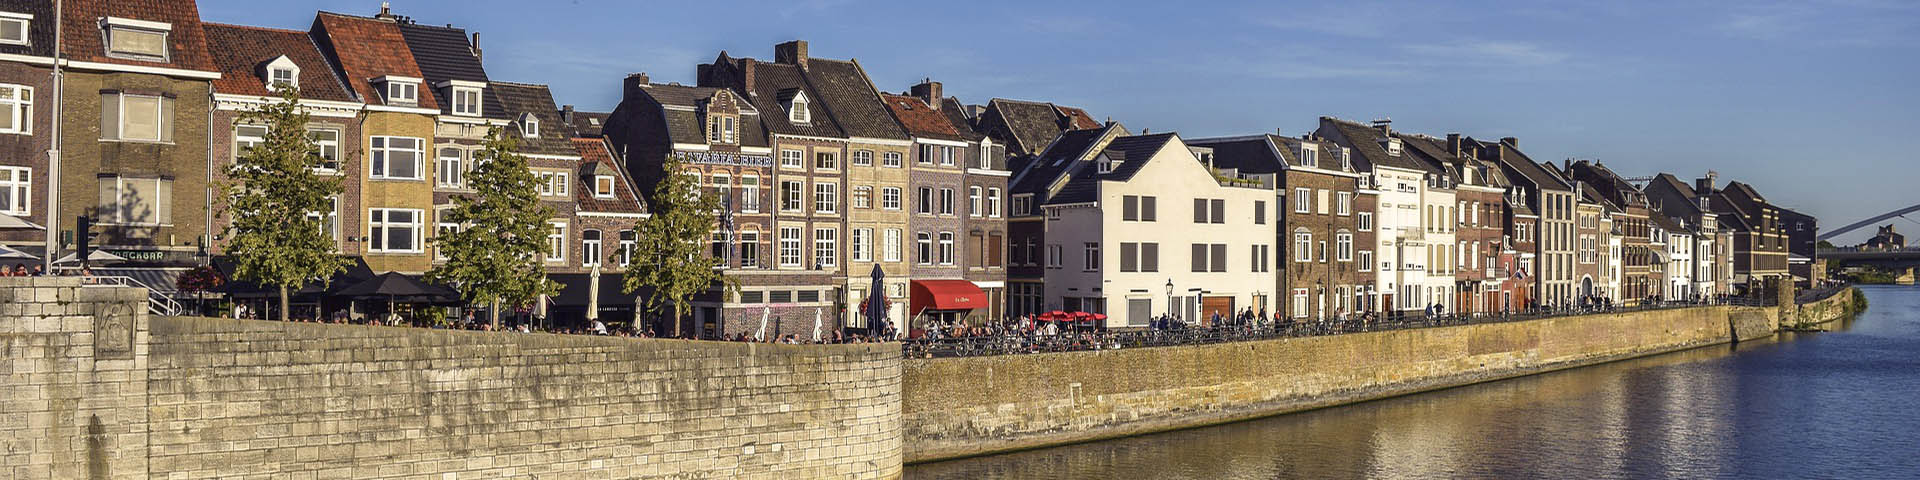 restaurants next to canal in maastricht